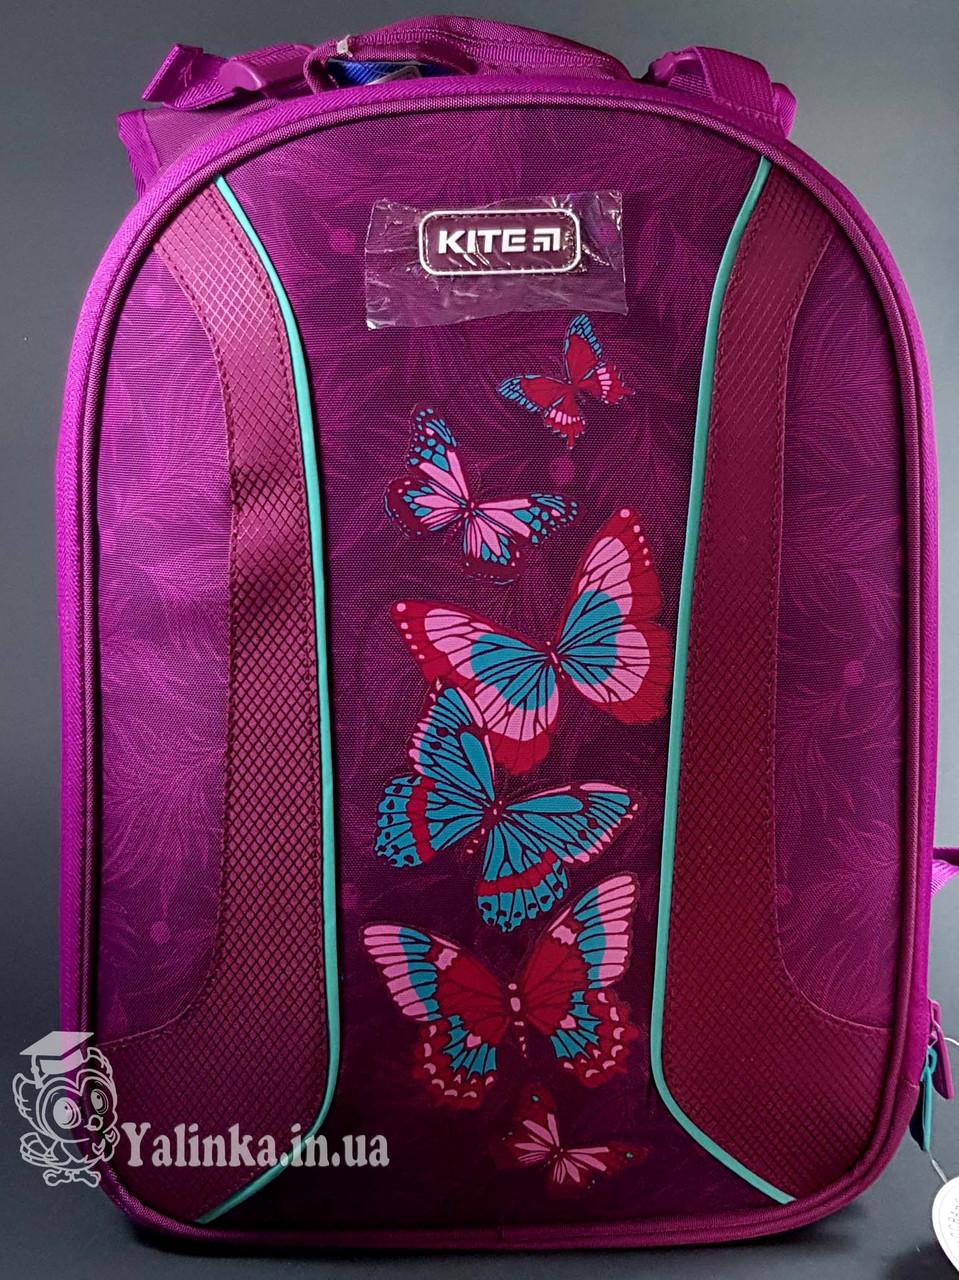 Рюкзак школьный каркасный Kite Education 703-1 Butterflies K19-703M-1 ранец  рюкзак школьный hfytw ranec